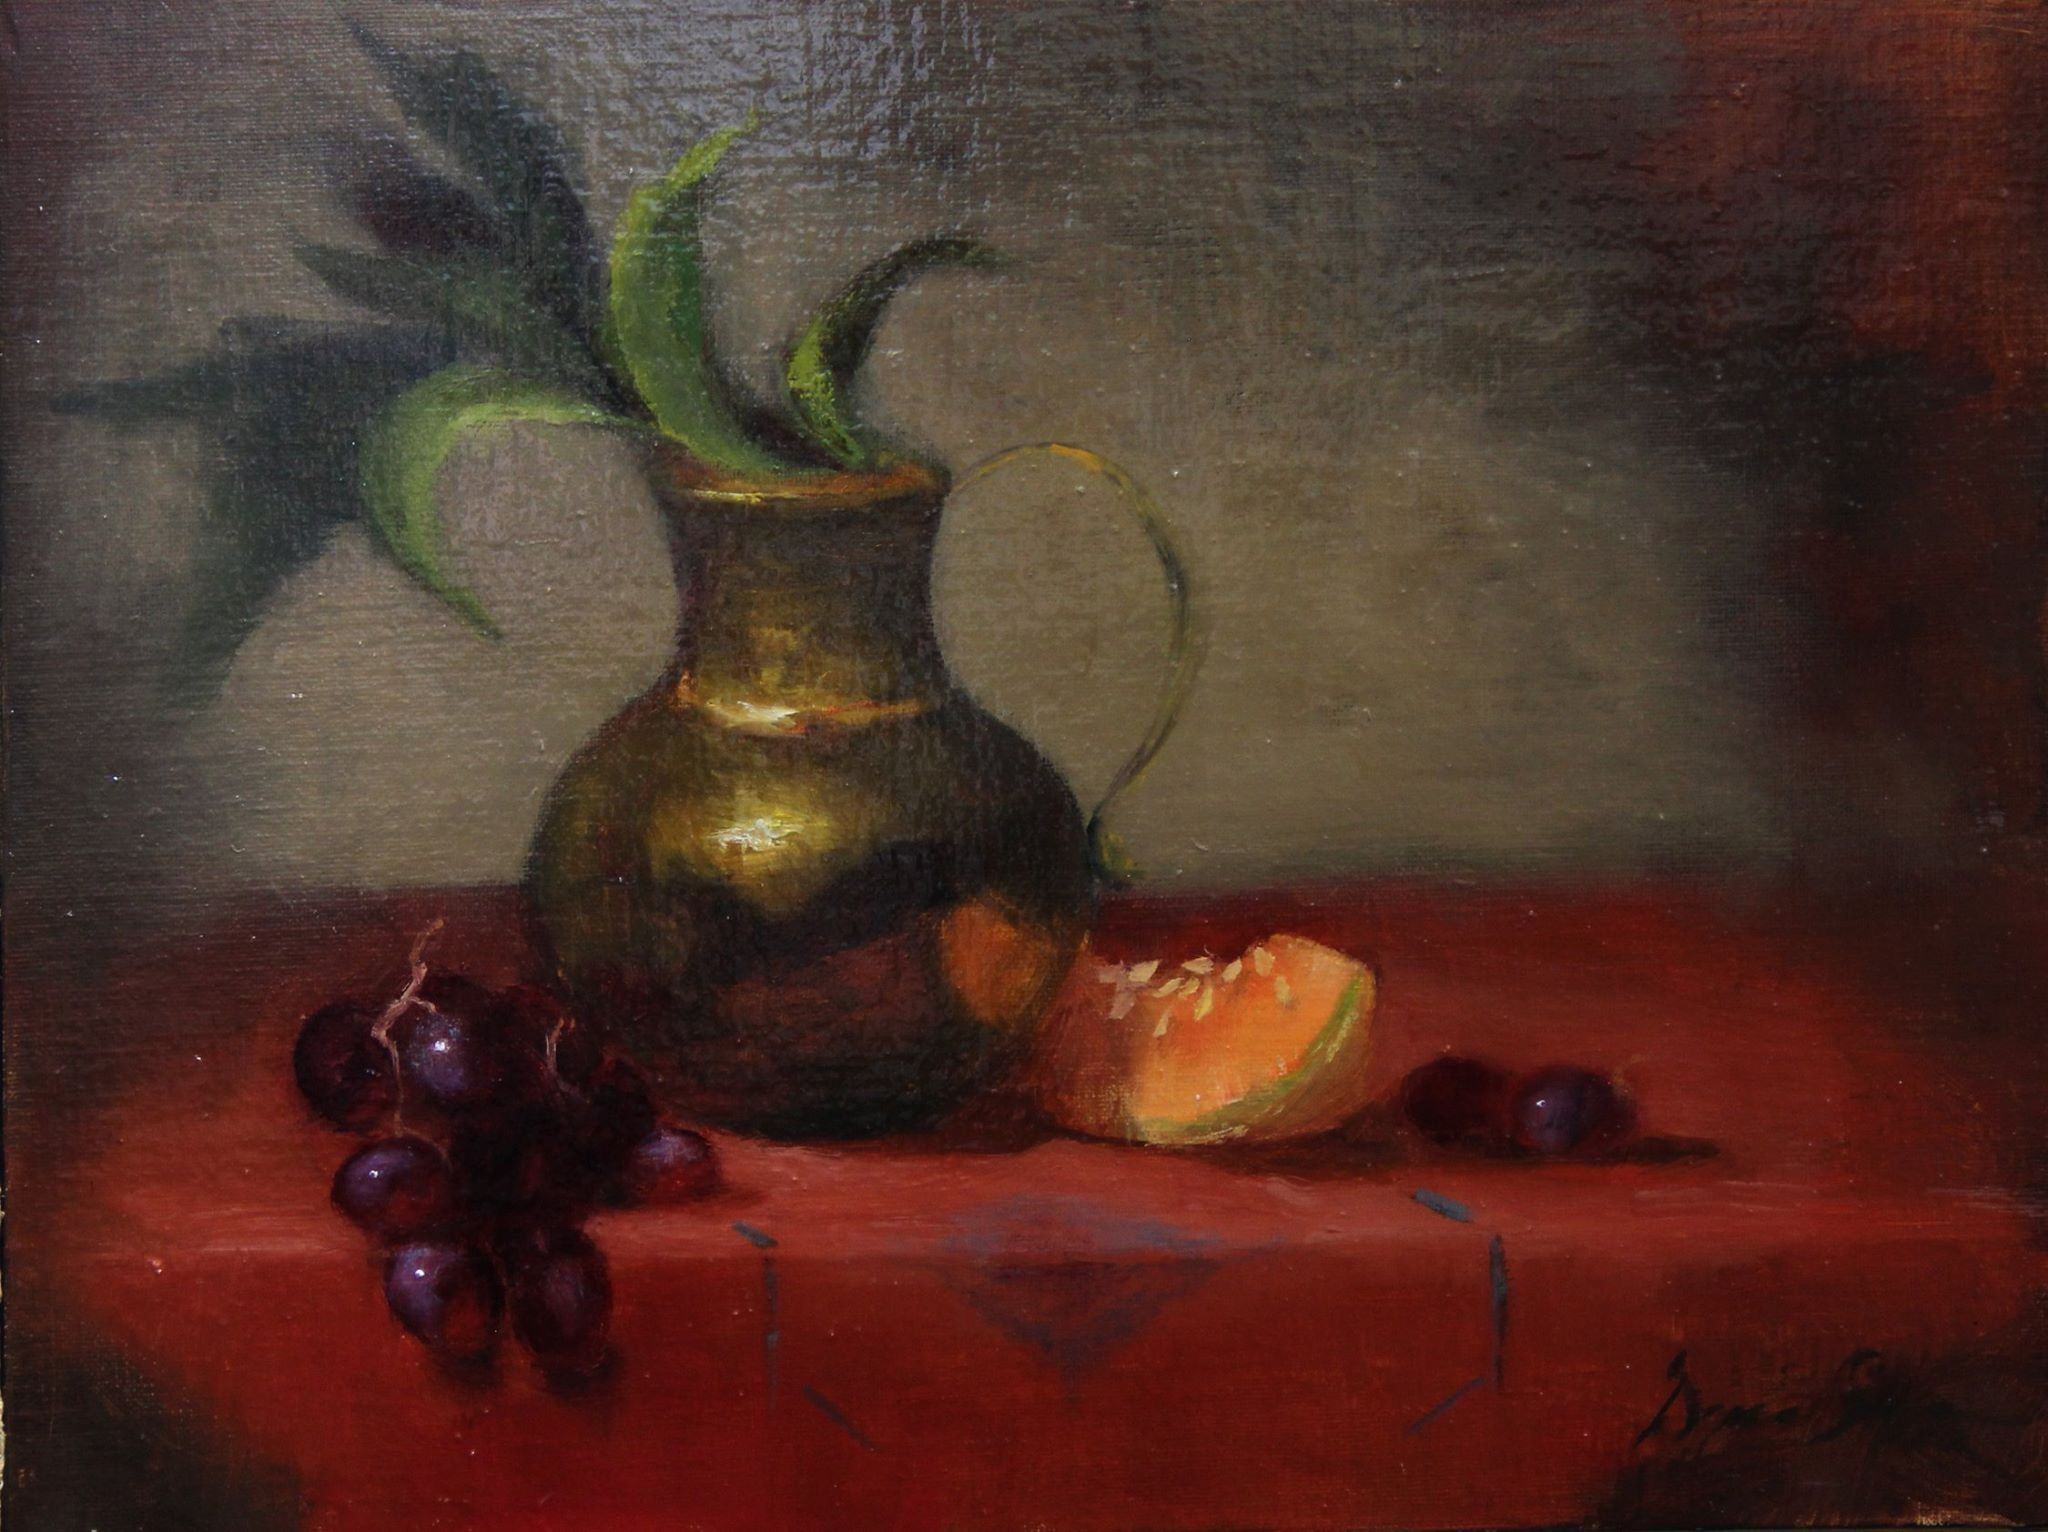 Brass pot and fruit x red door gallery diana shearon art